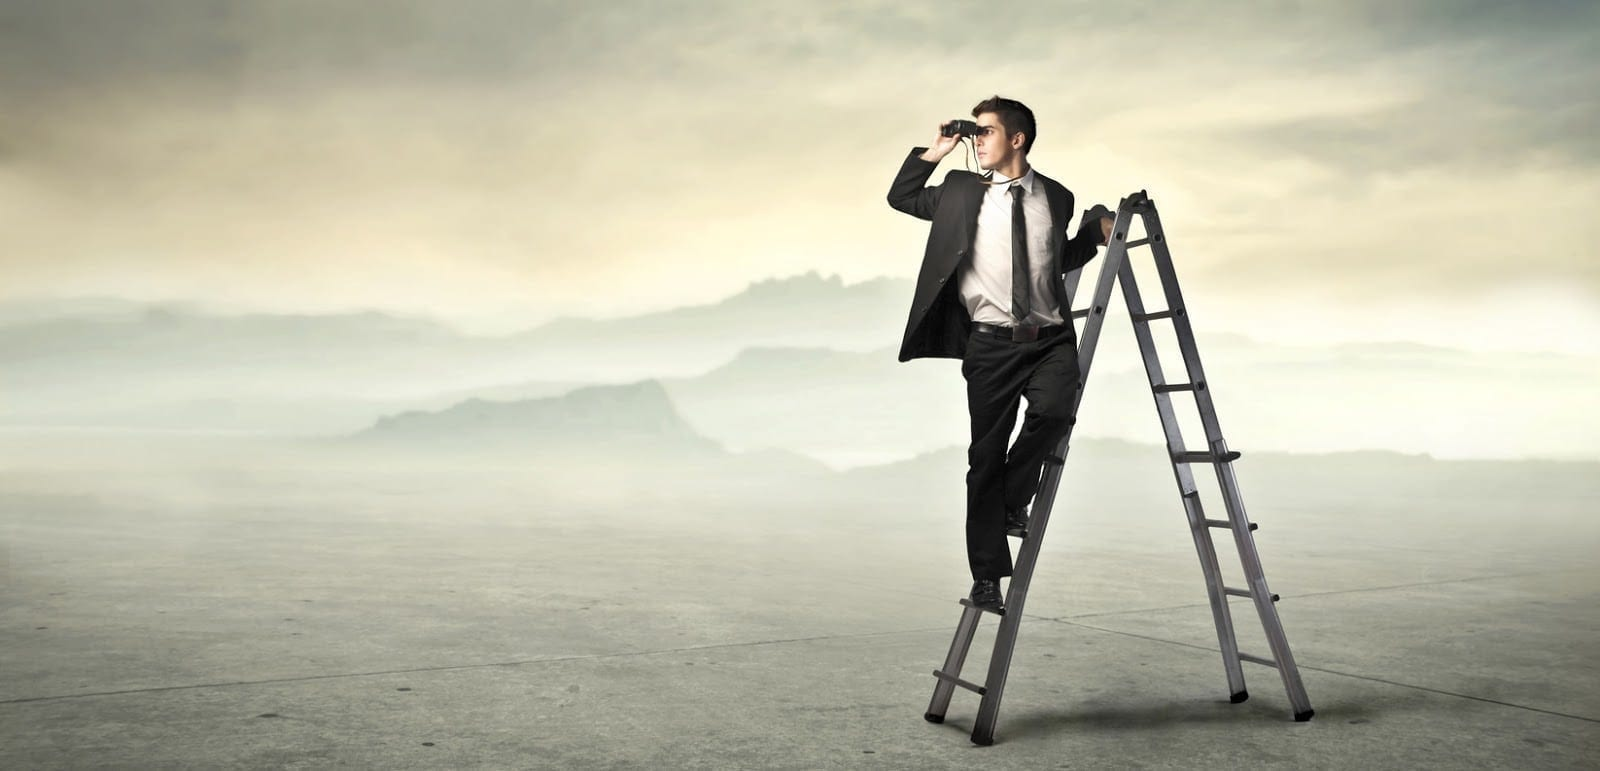 como encontrar oportunidades 5